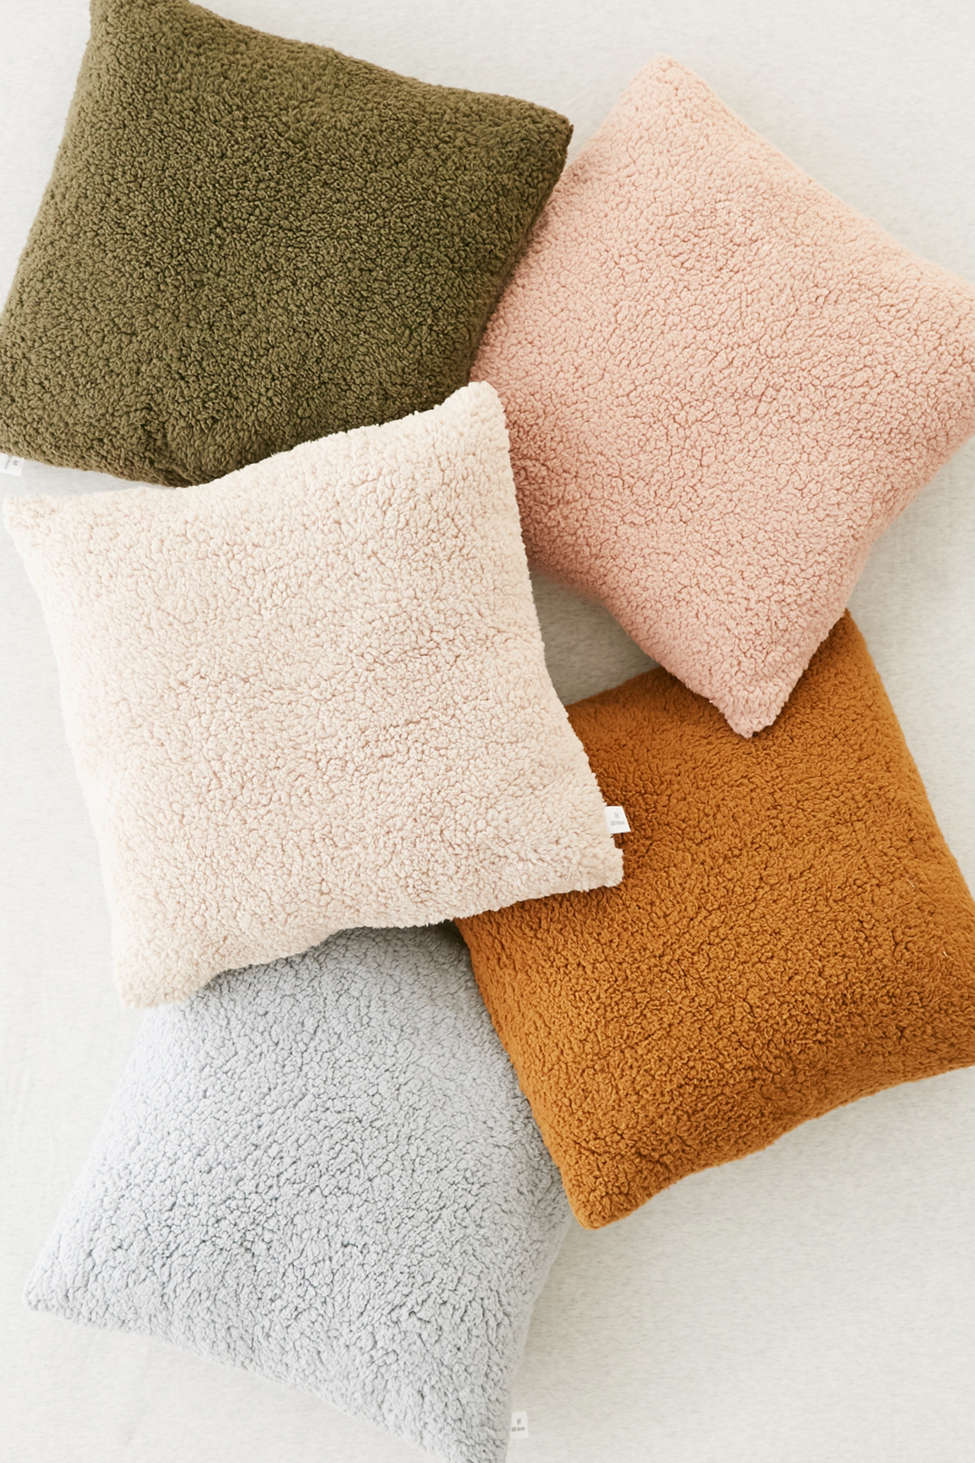 sherpa fleece throw pillow | urban outfitters Where to Get Throw Pillows